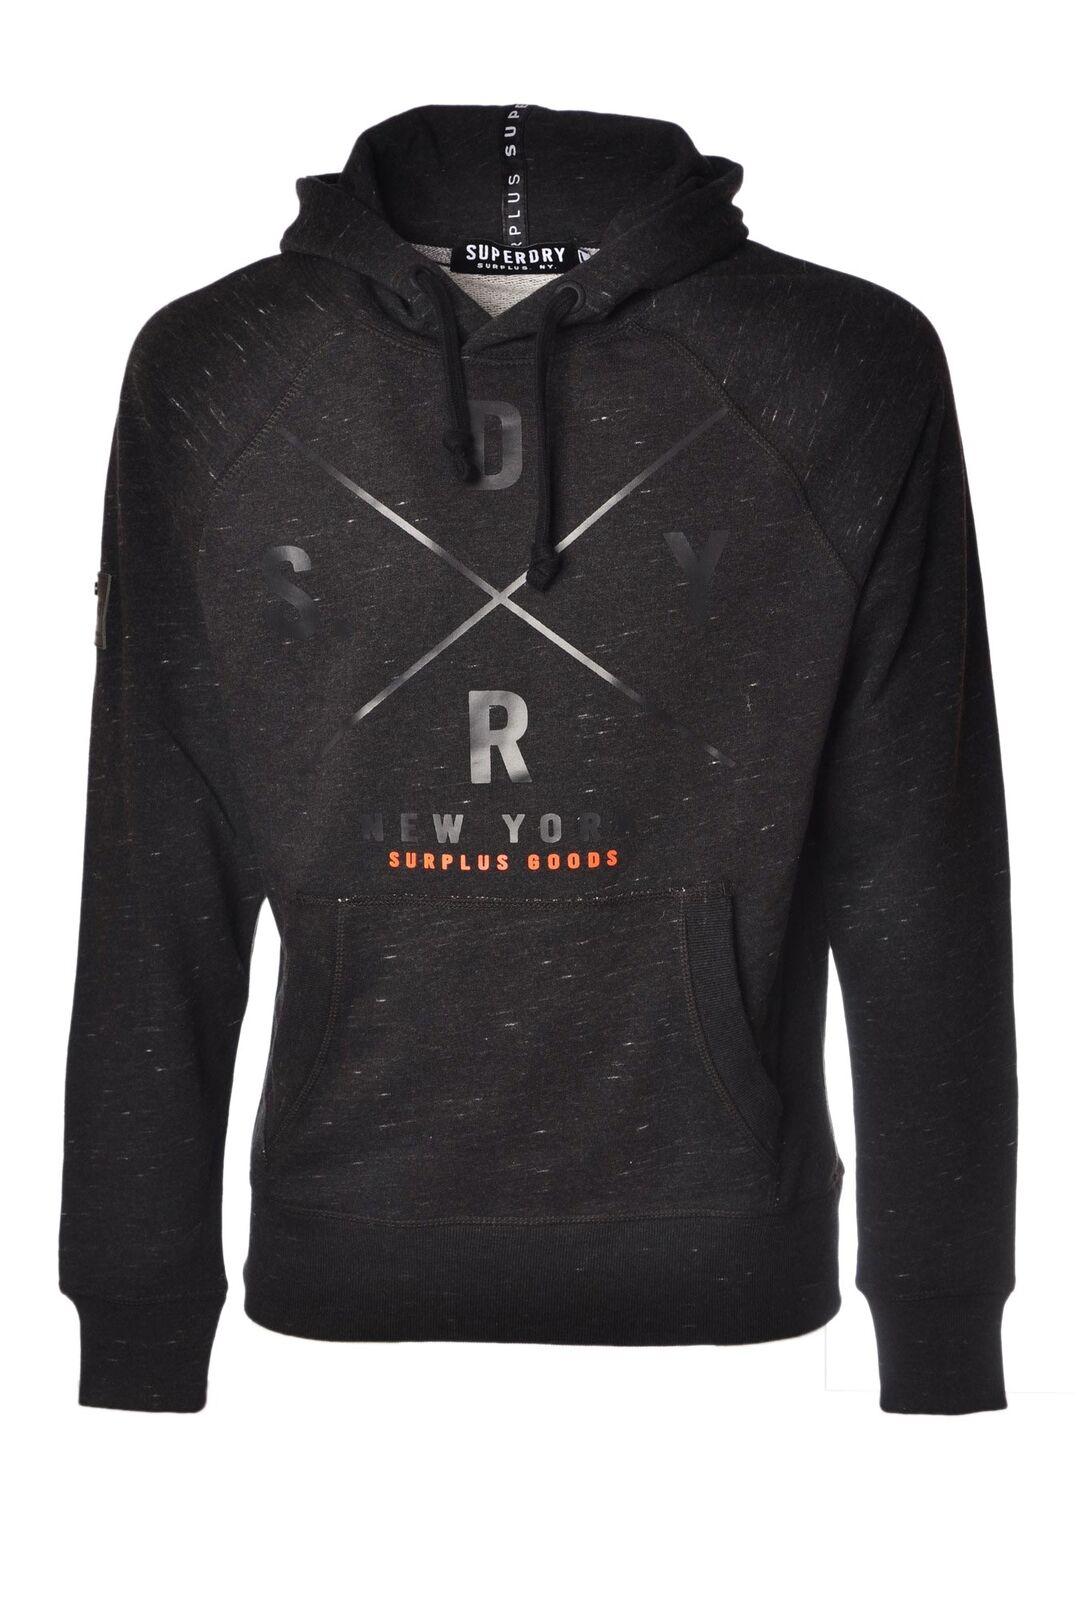 Superdry - Topwear-Sweatshirts - Mann - Grau - 4349011M184041